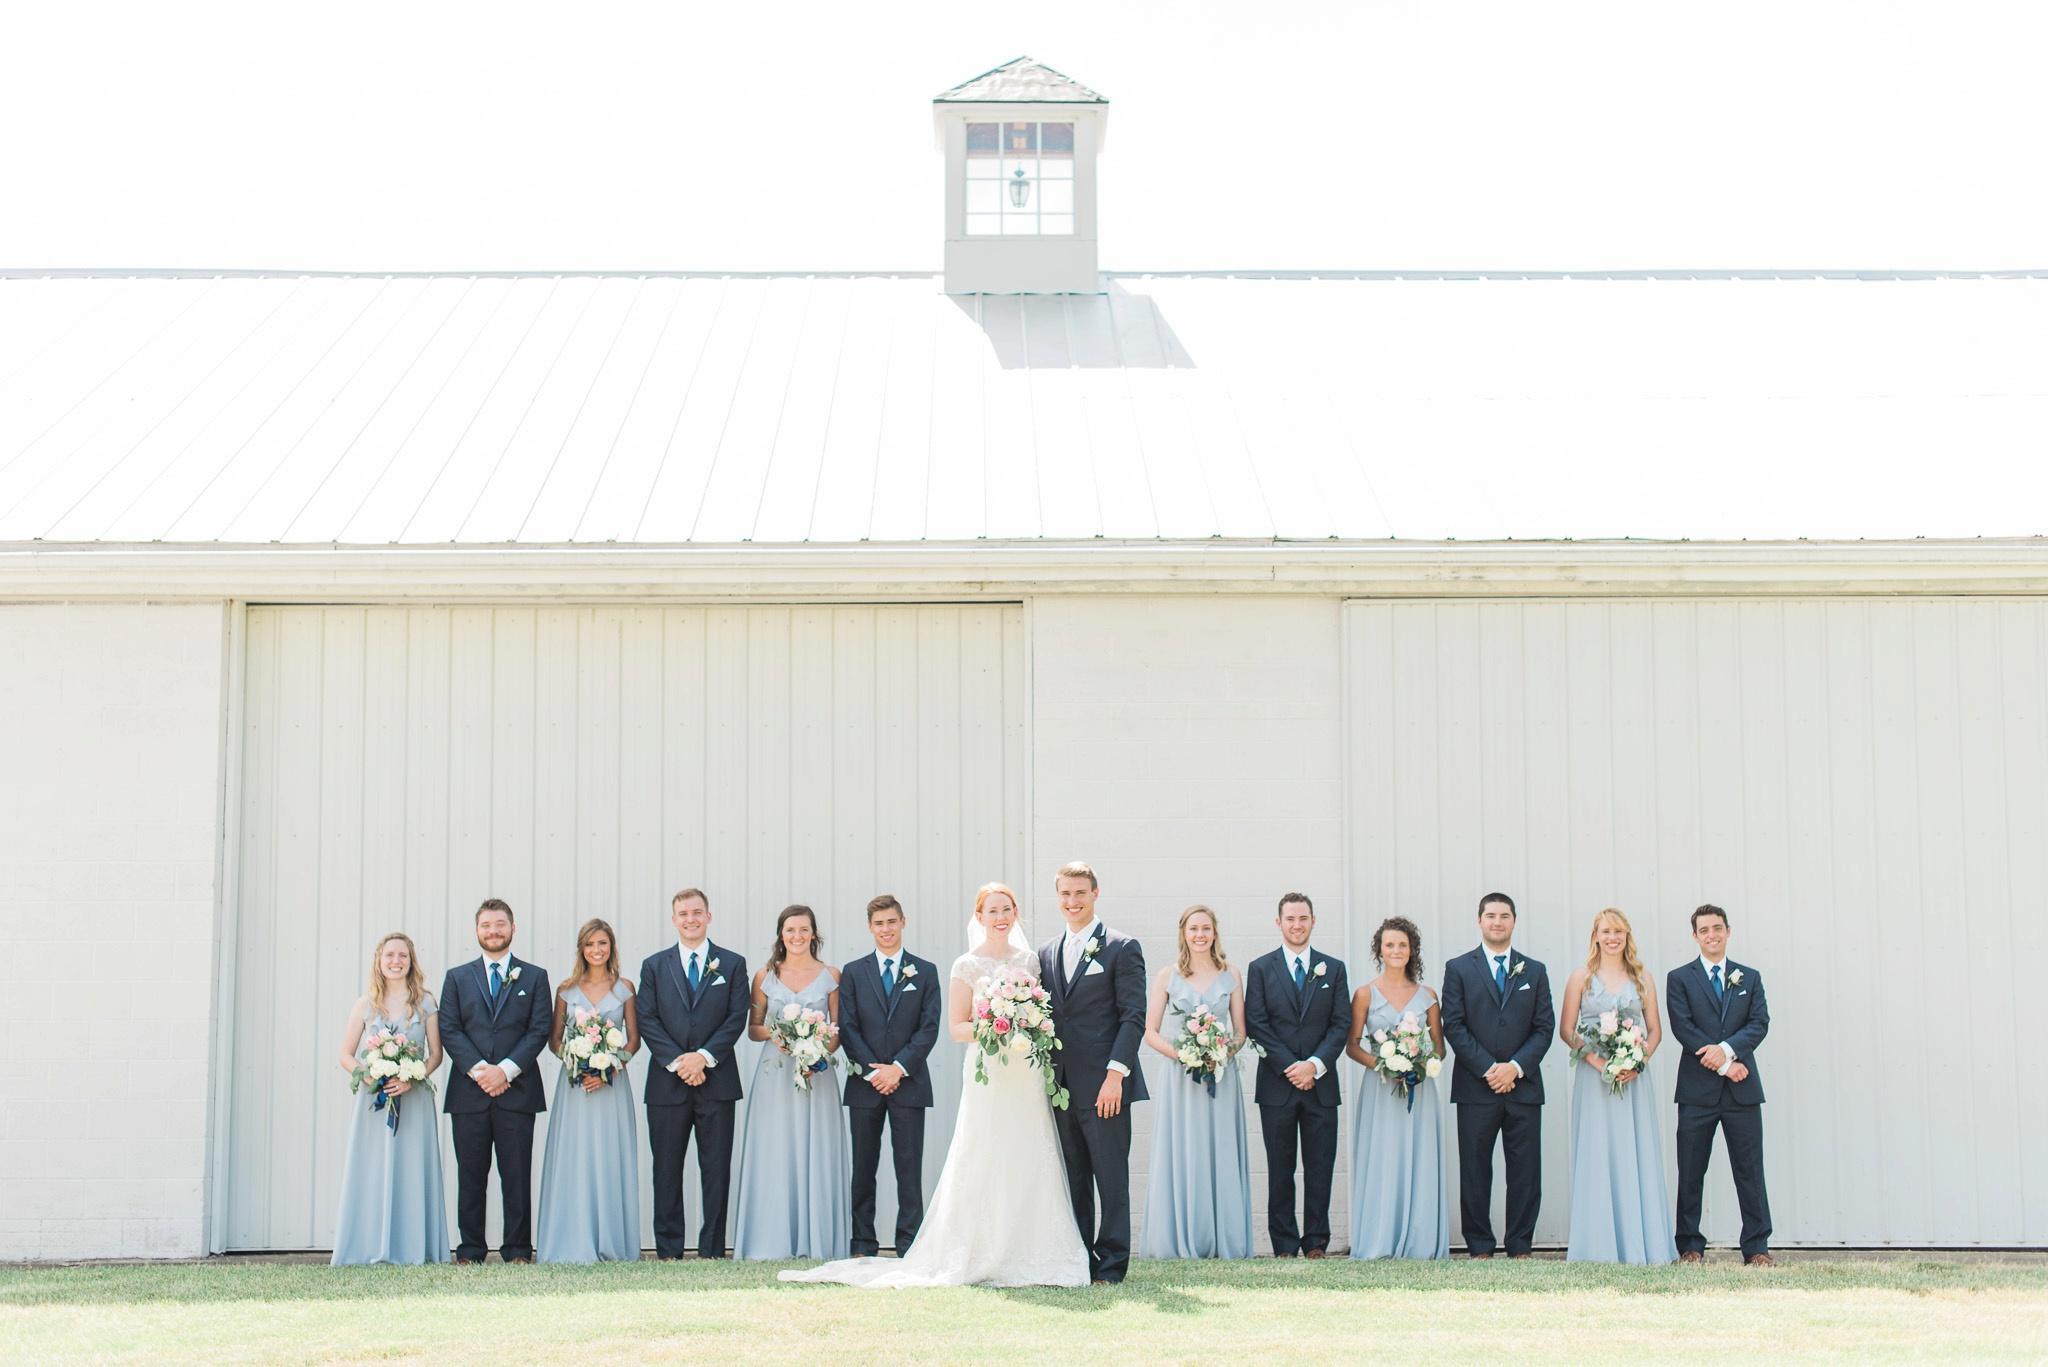 sunbury-ohio-wedding-hannah-johnathan_0070.jpg